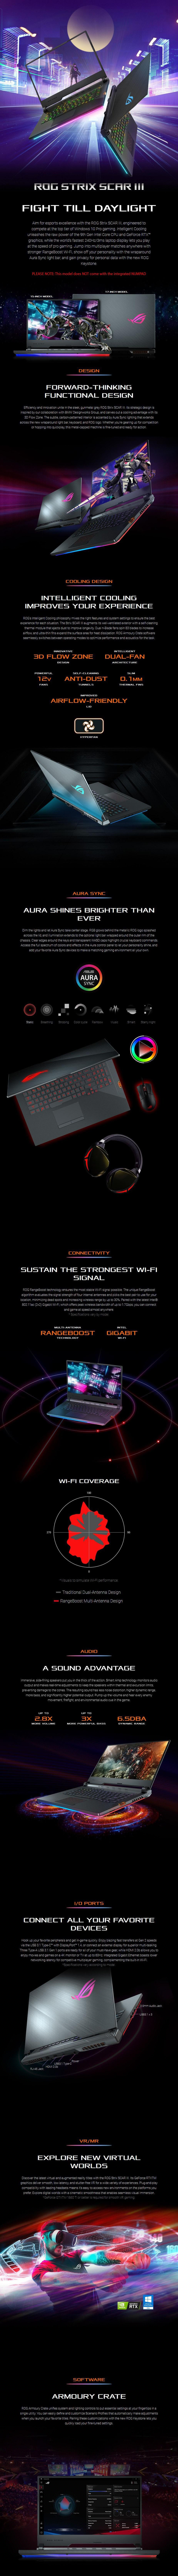 "ASUS ROG Strix Scar III GL531GU 15.6"" 144Hz Gaming Laptop i7 16GB 512GB 1660Ti - Overview 1"